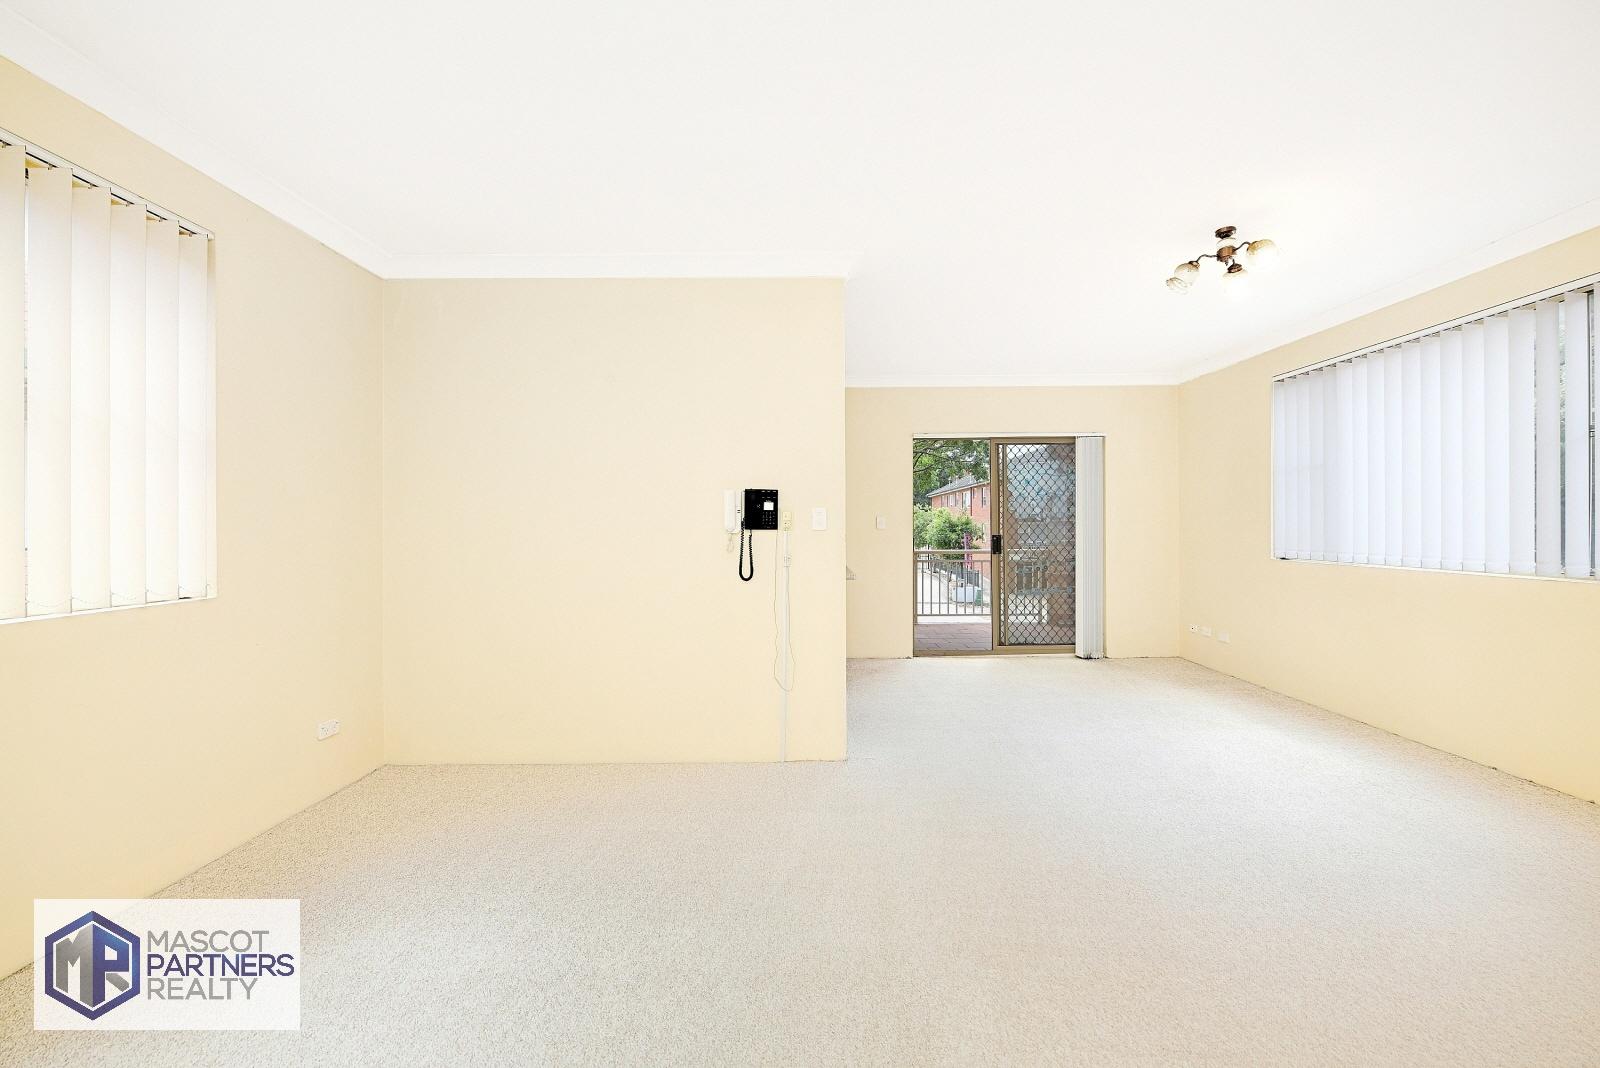 3/17 Victoria Avenue, Penshurst NSW 2222 (LEASED)